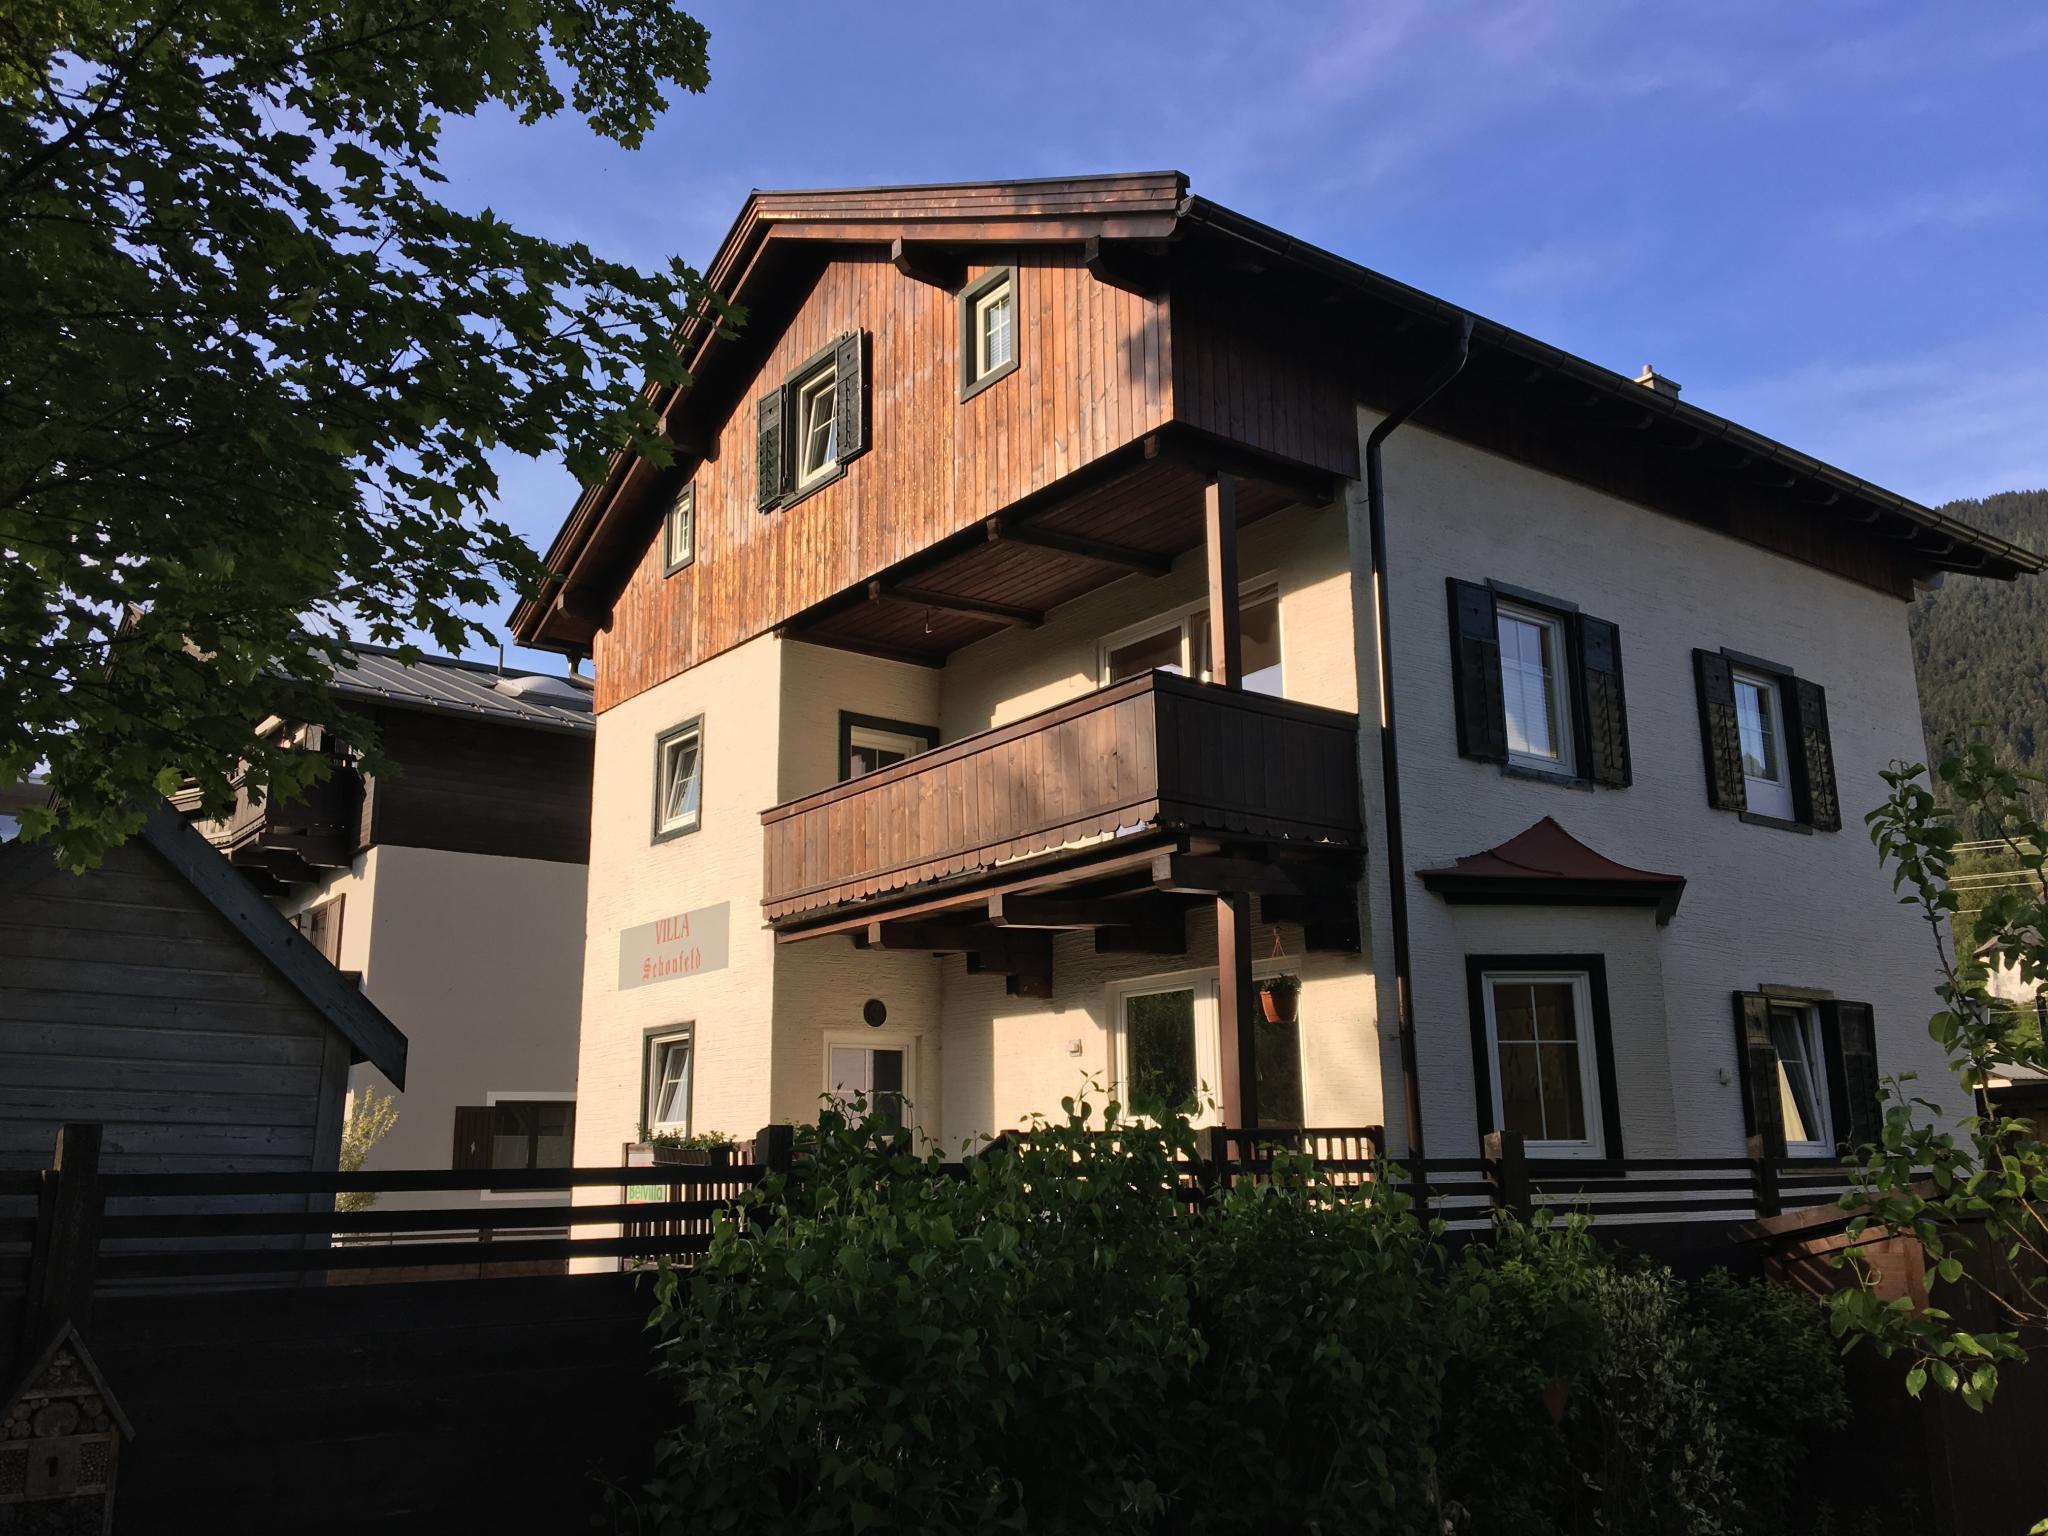 Chalet Schönblick I Tirol